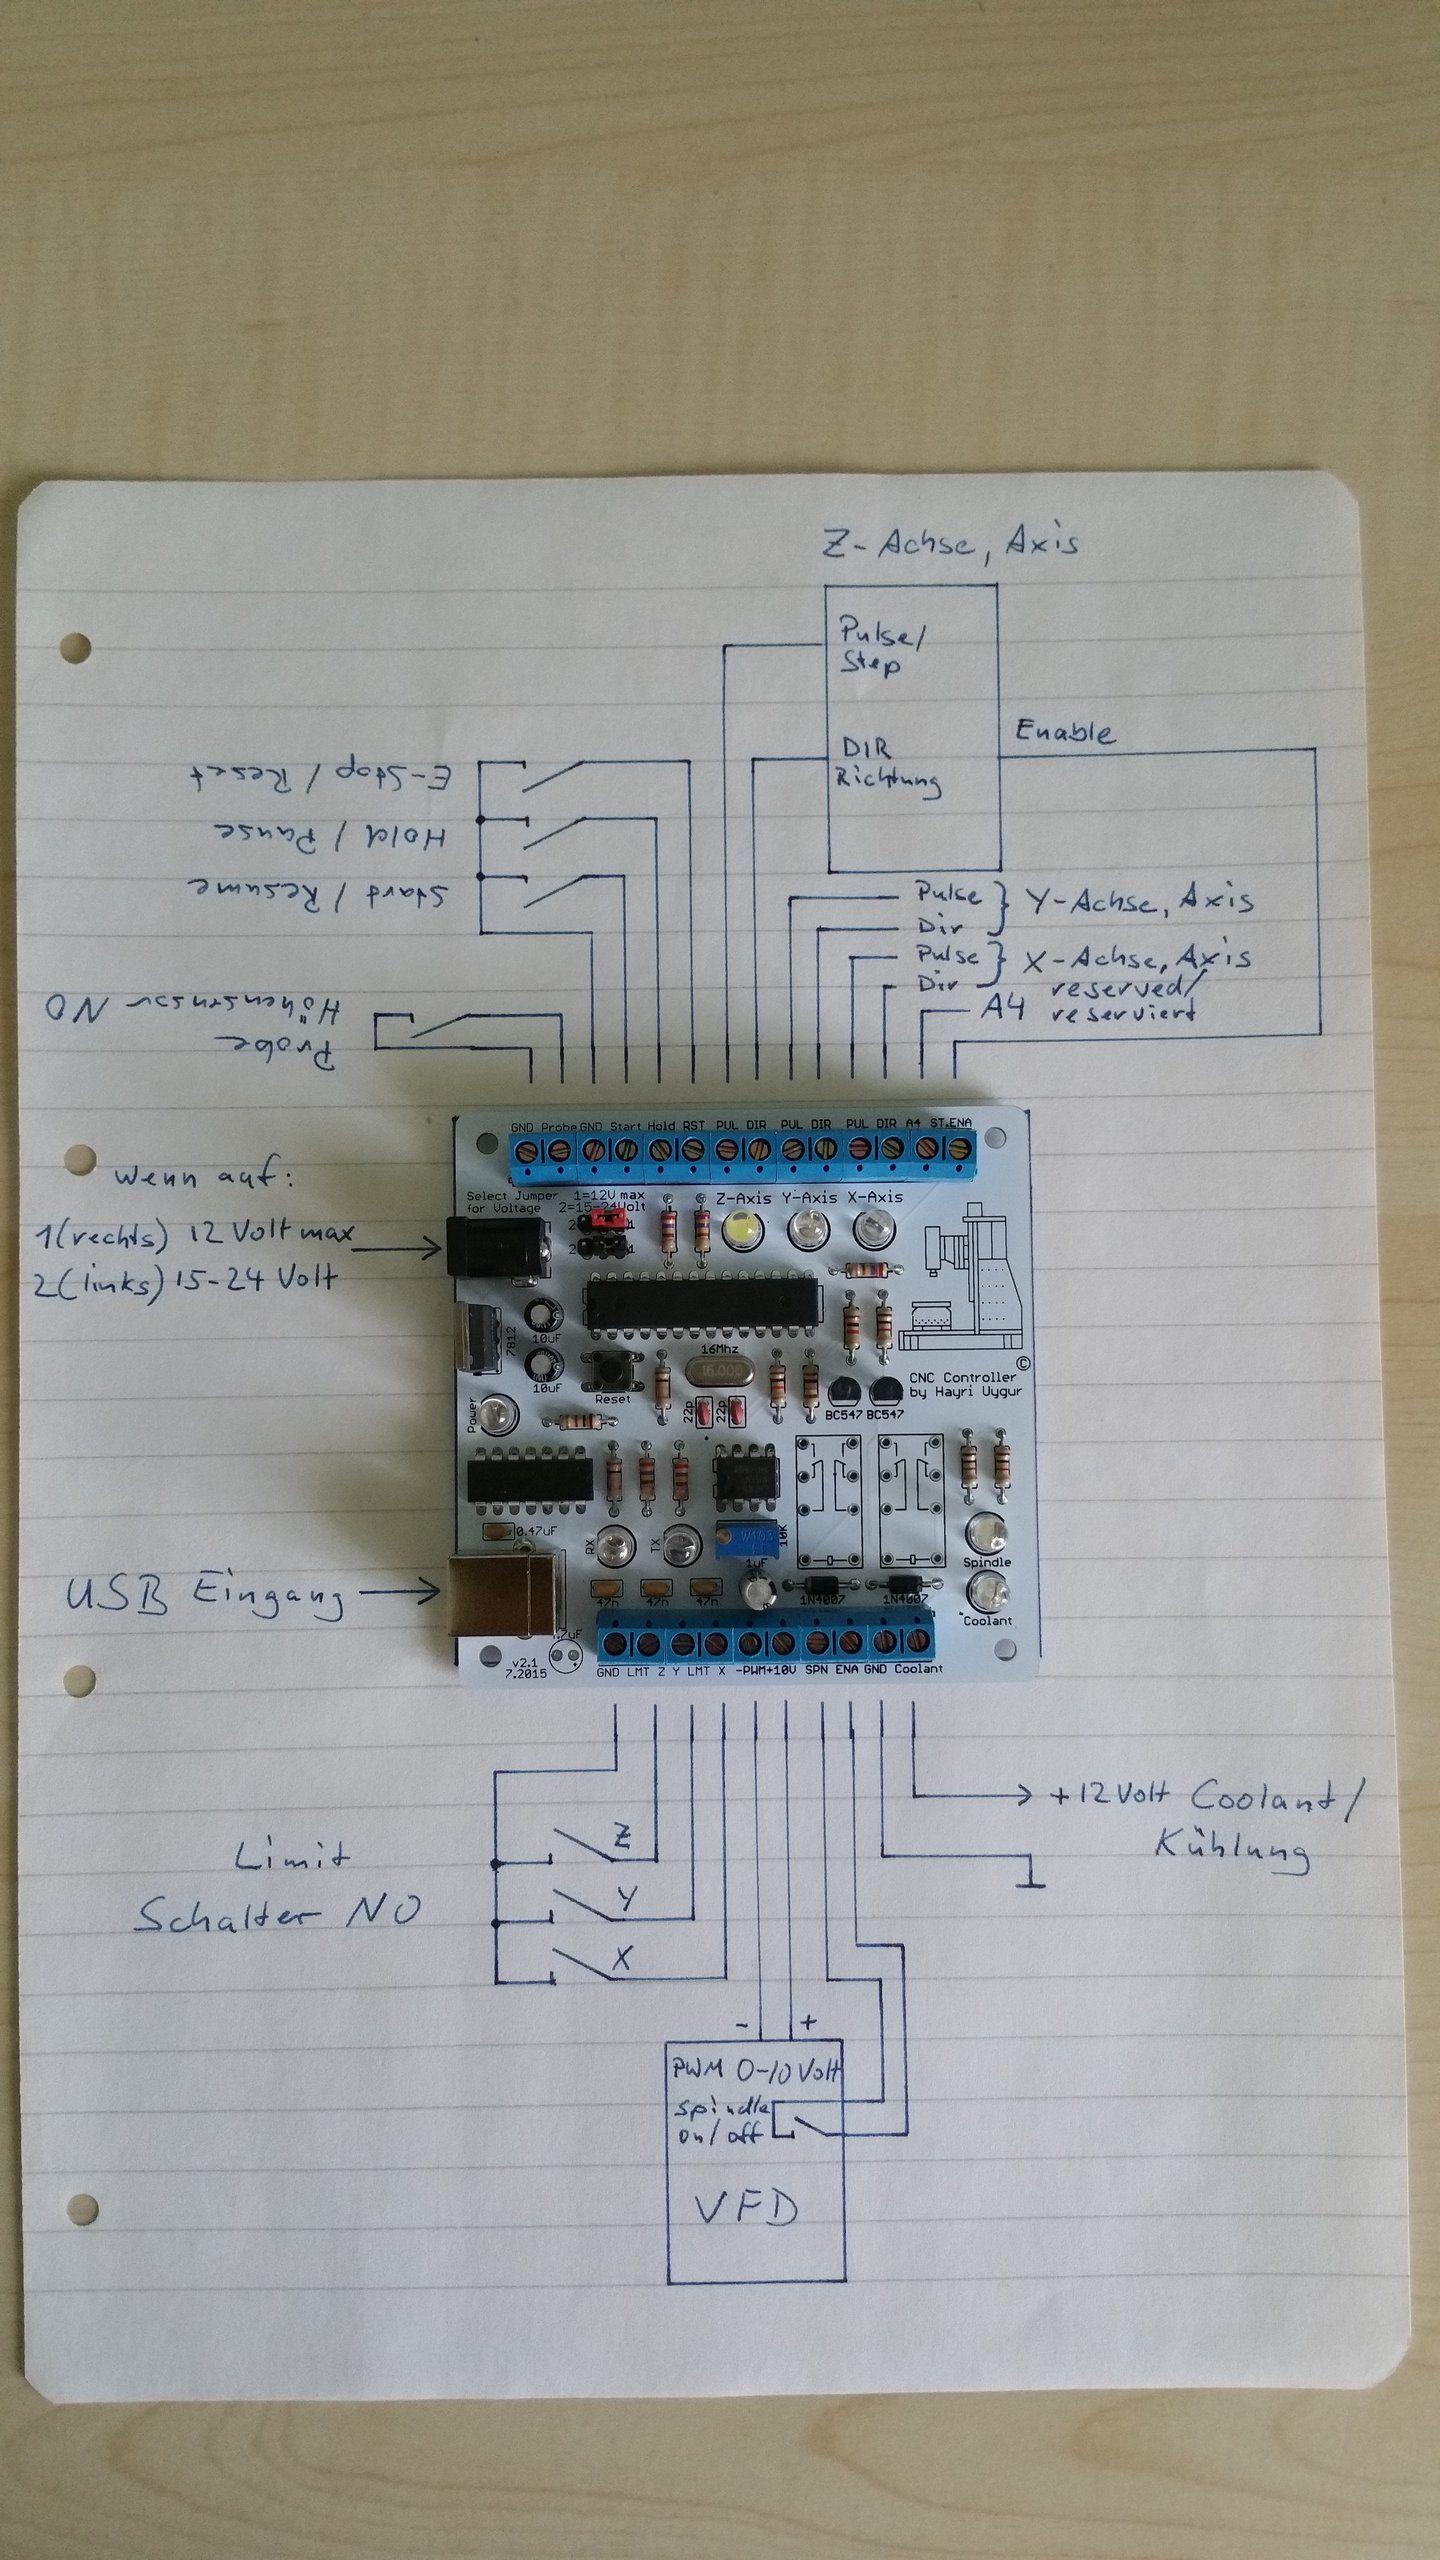 medium resolution of phoenix usb cnc controller with pwm output